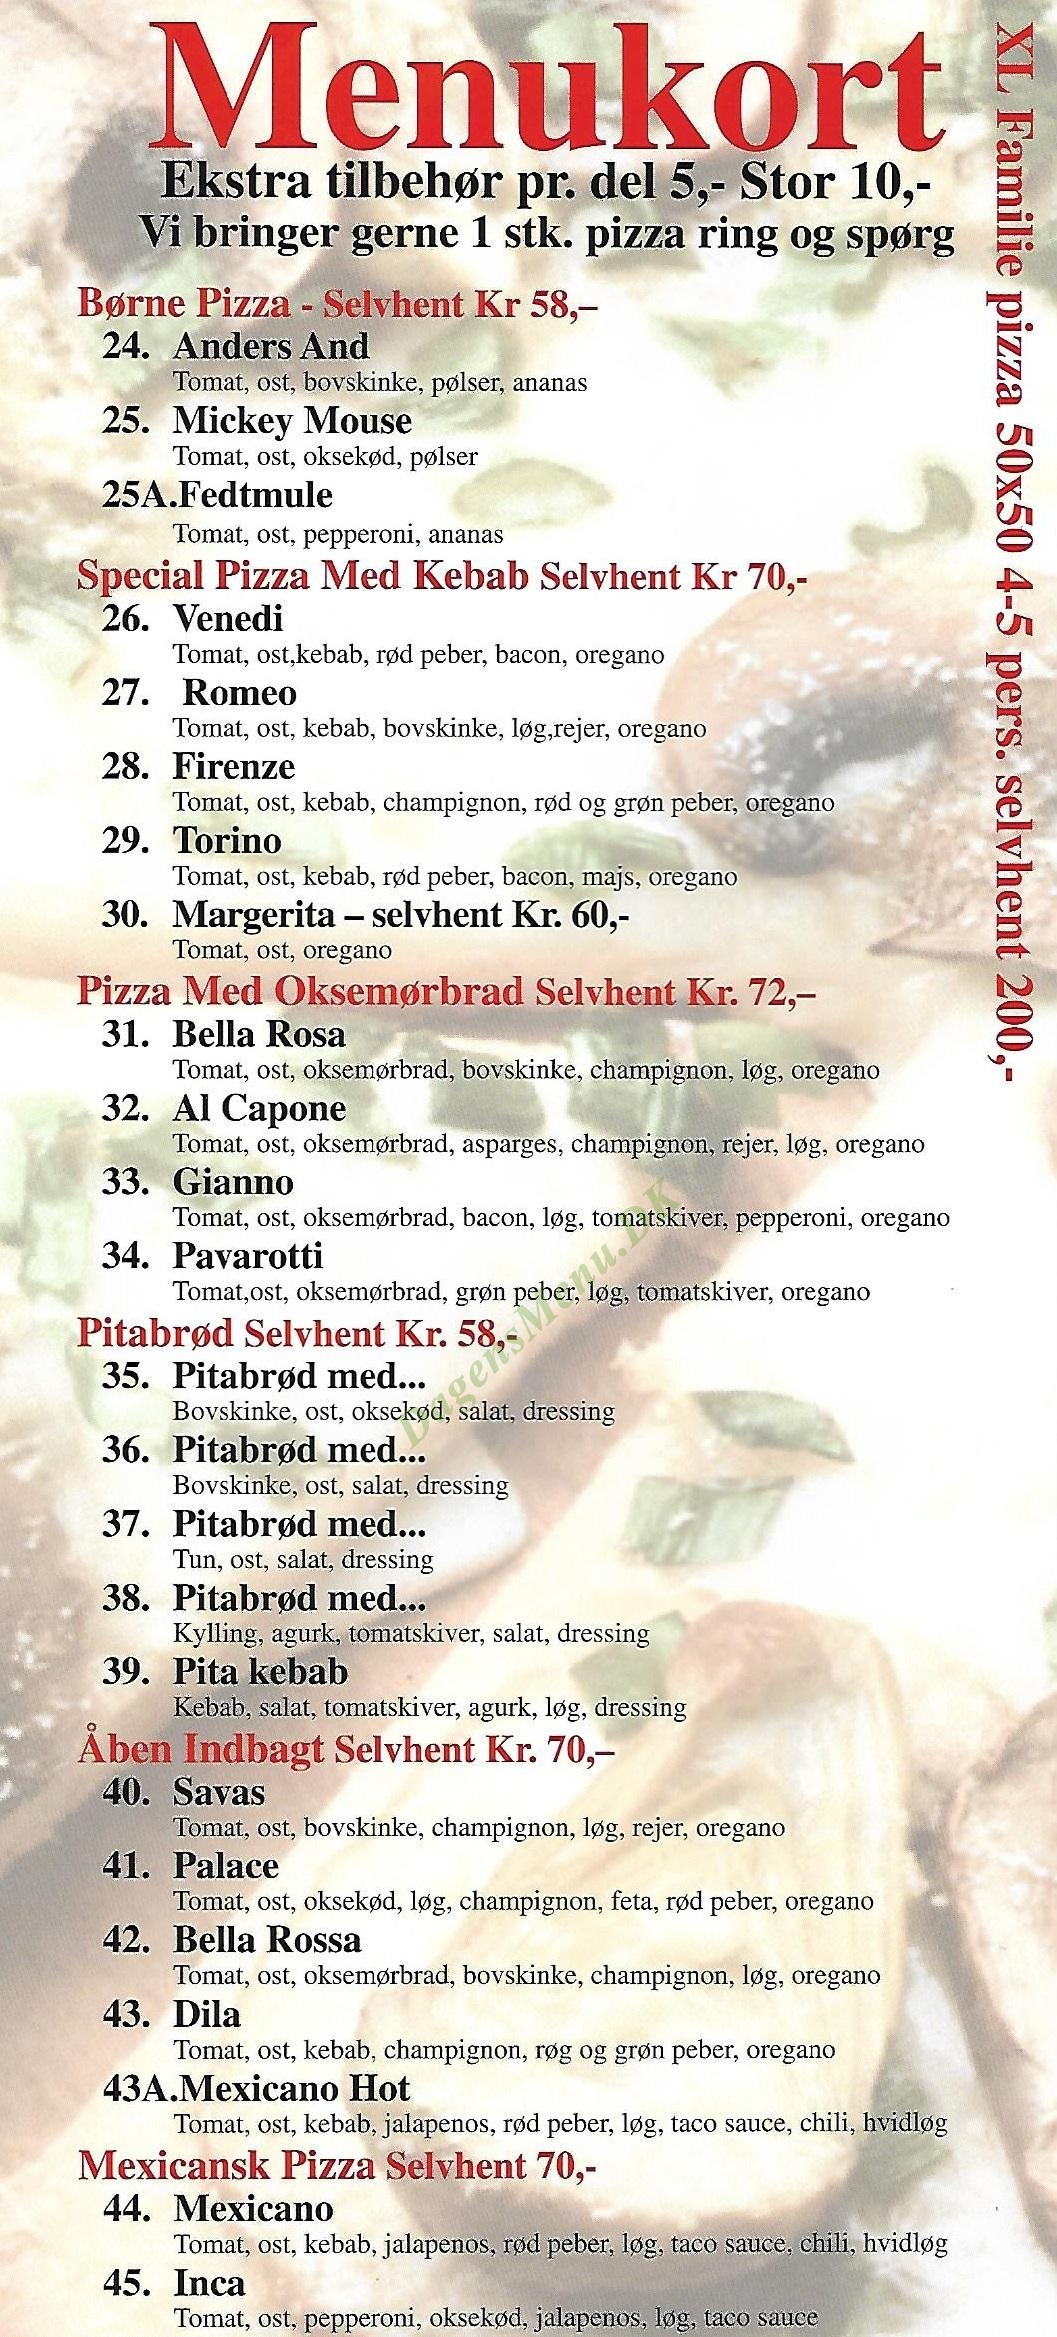 Pizza Napoli - Menukort